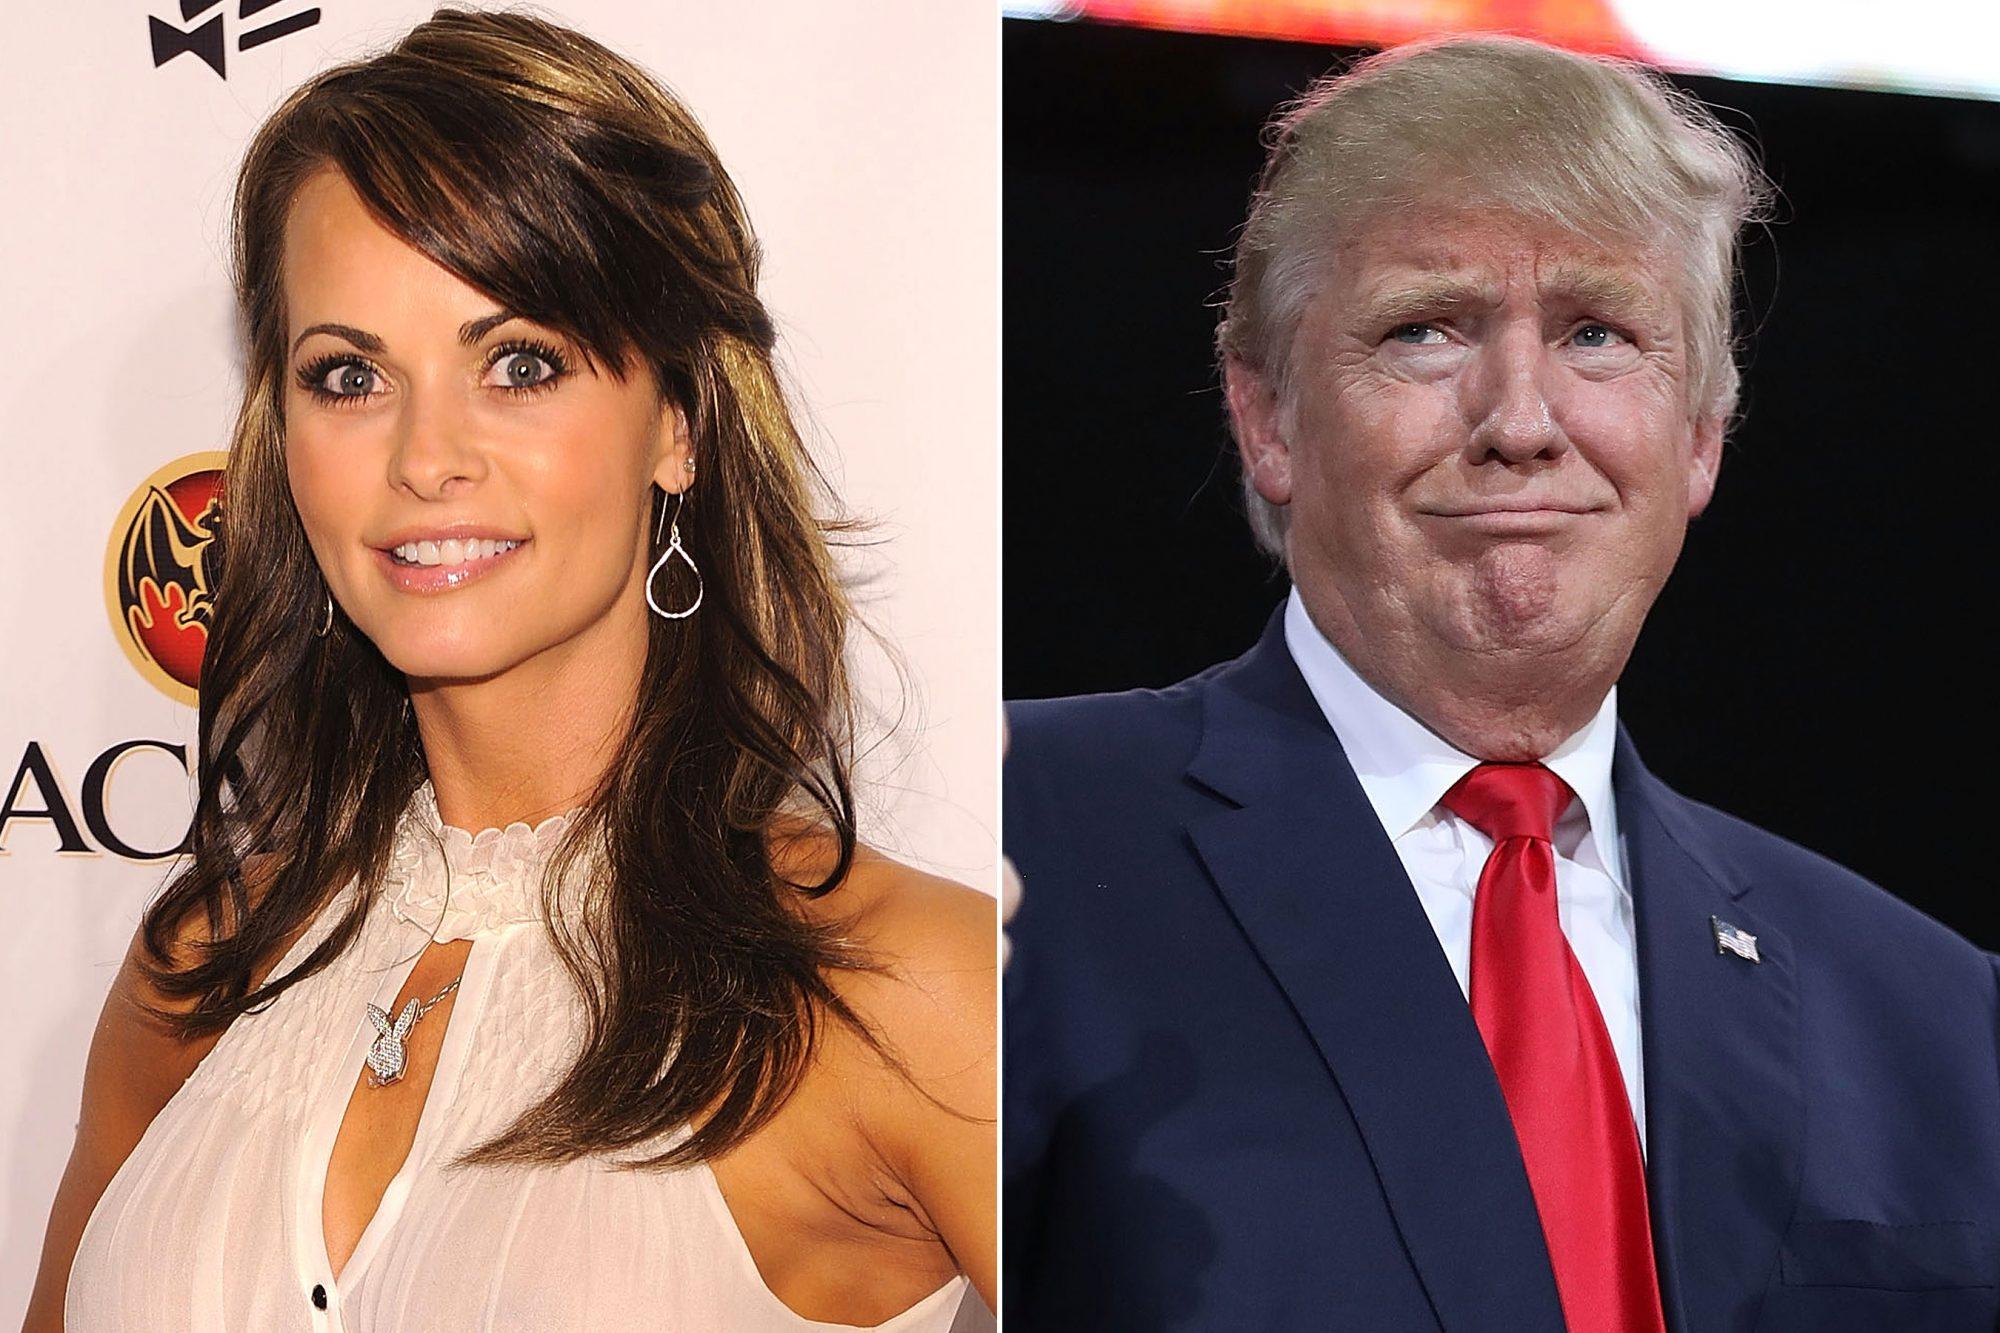 Karen-McDougal-Donald-Trump